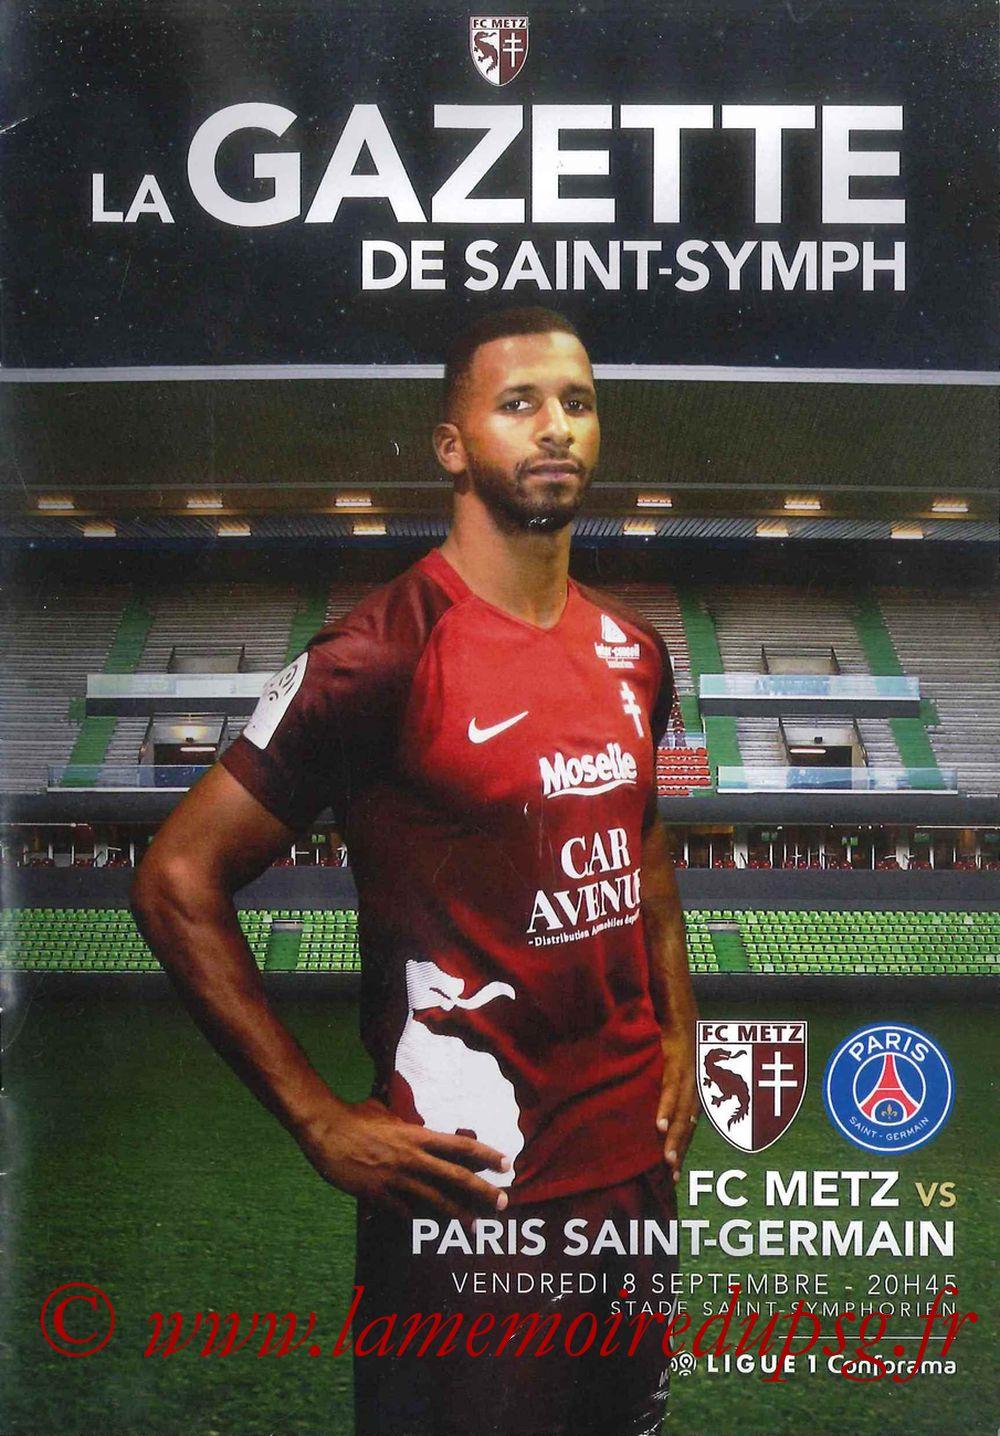 2017-09-08  Metz-PSG (5ème L1, La Gazette de Saint-Symph)